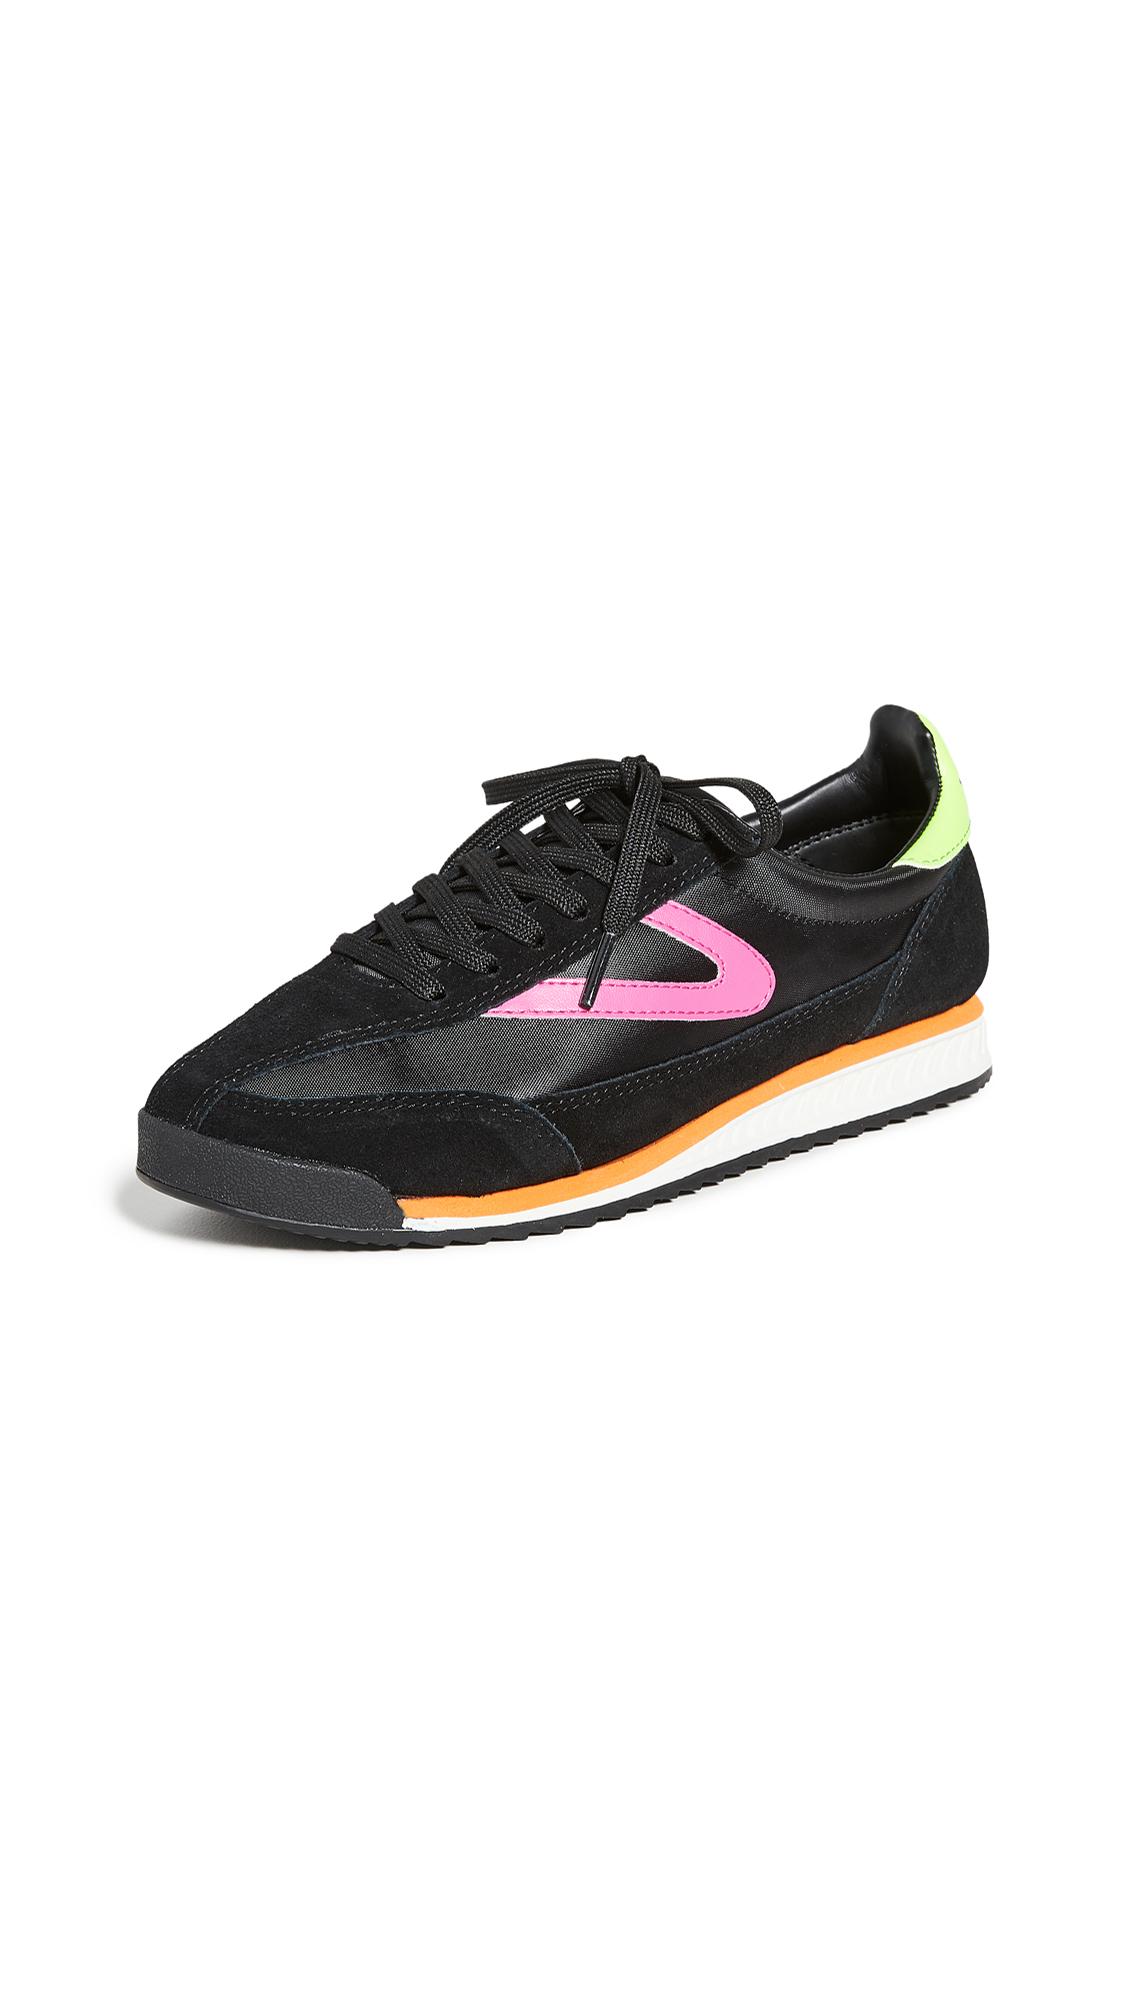 Tretorn Rawlins 10 Sneakers - 40% Off Sale